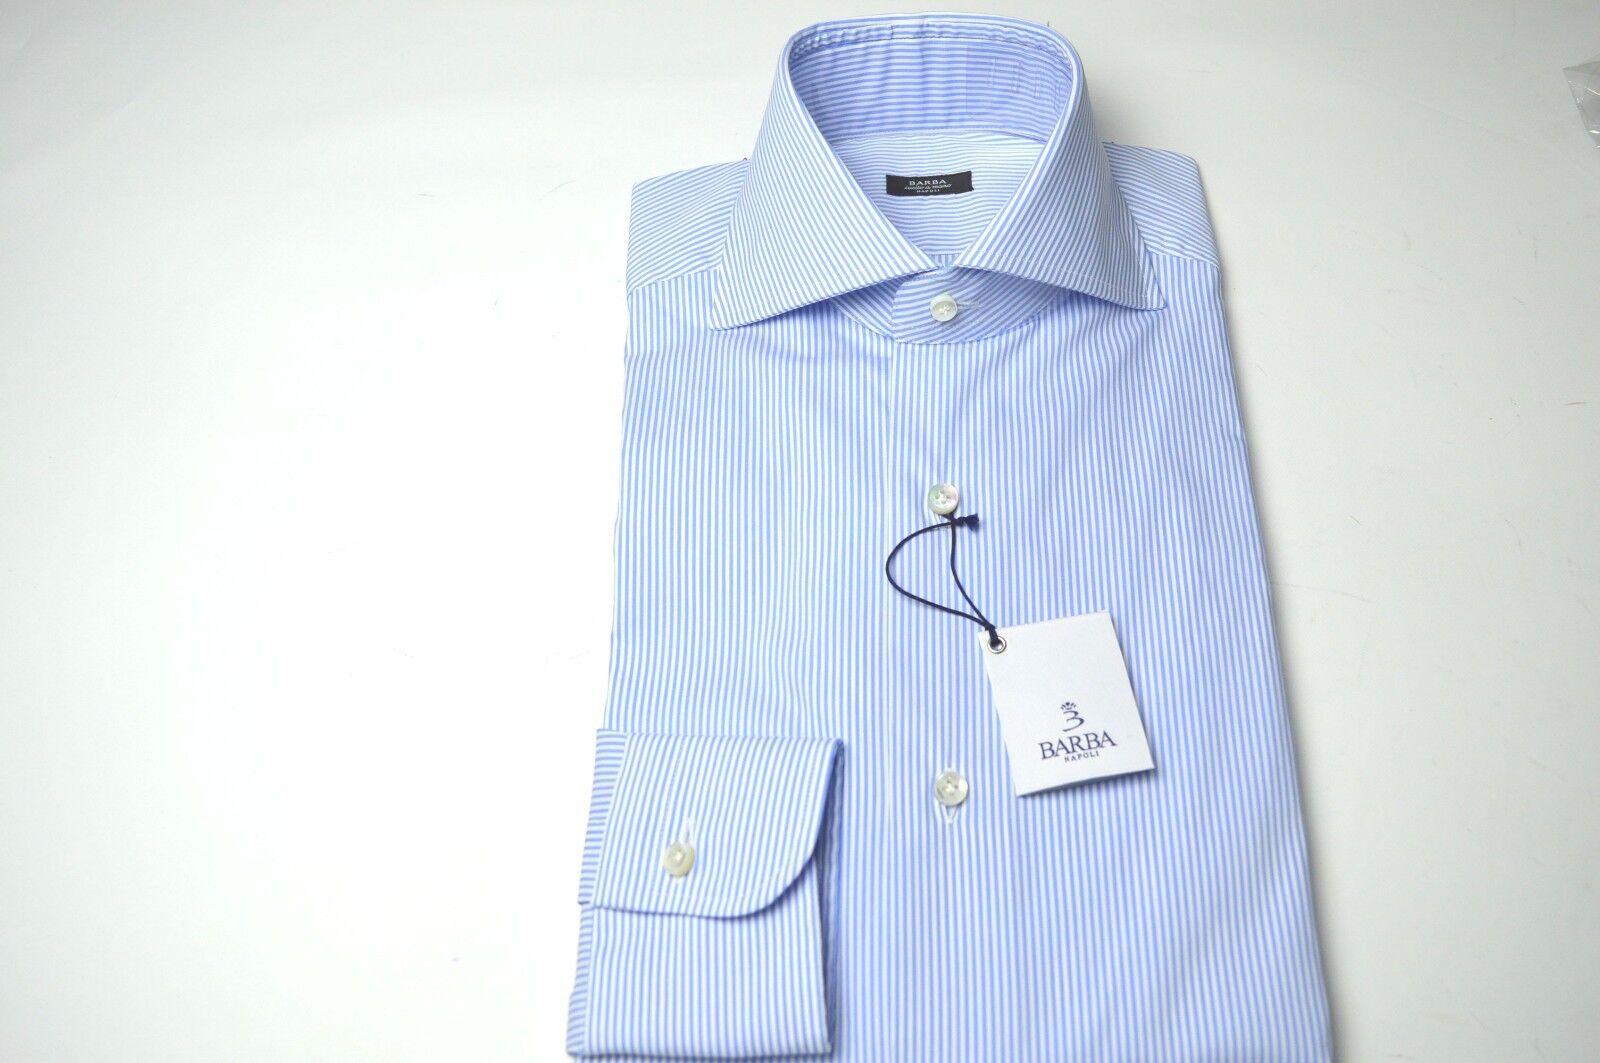 NEW BARBA  Dress SHIRT  100% Cotton Größe 17  Us 43 Eu  (BA10)